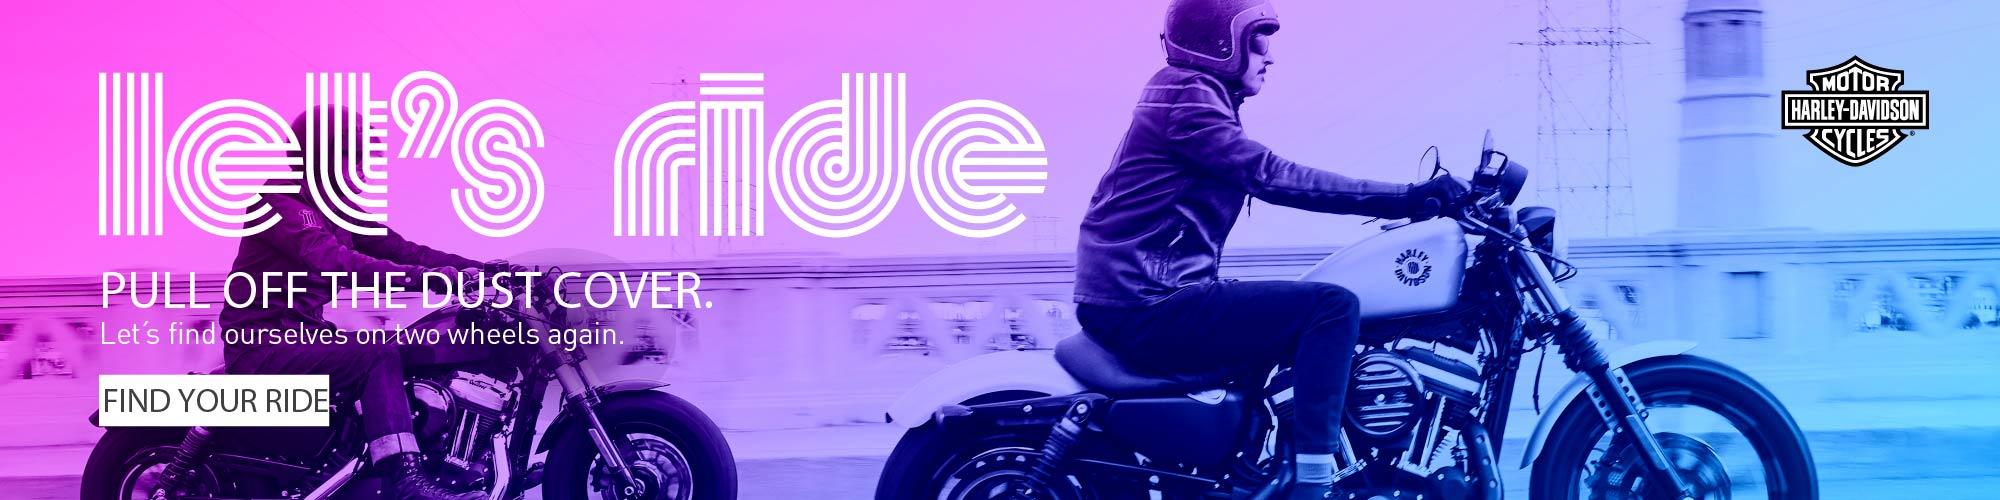 Find Your Ride At Destination Silverdale Harley-Davidson